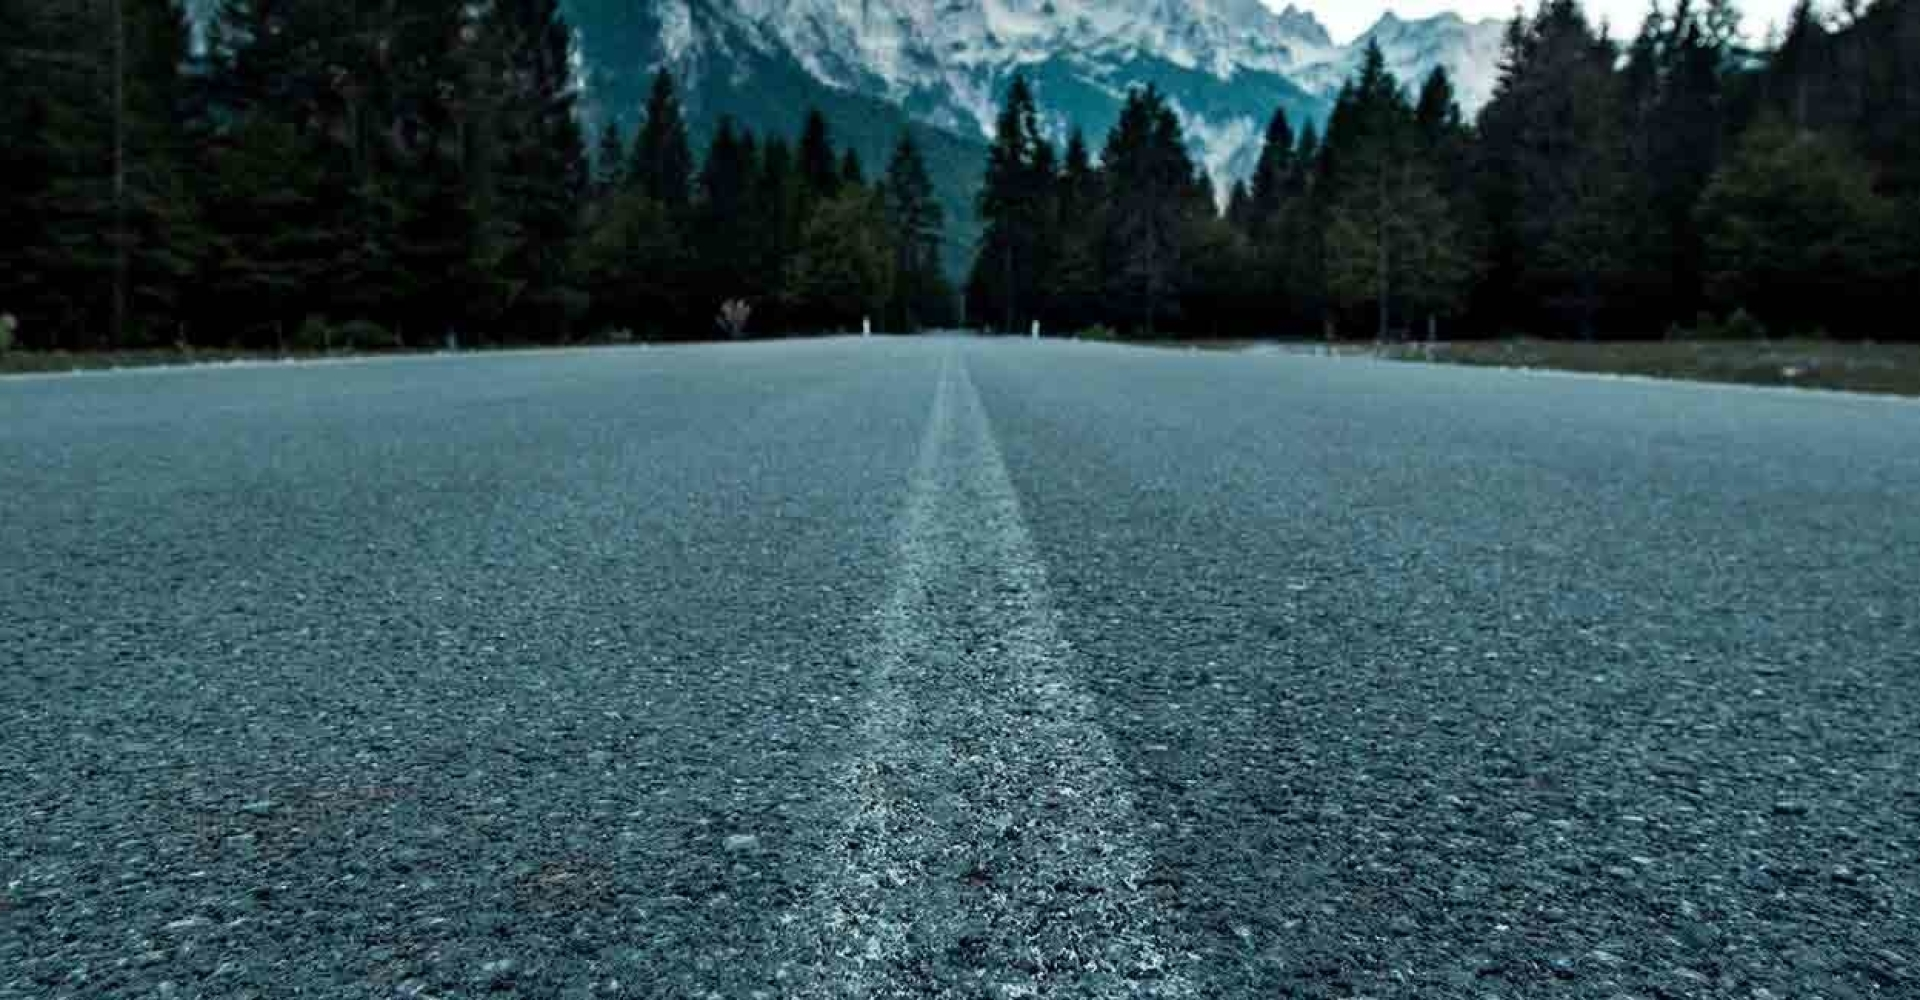 te-velde-coaching-weg-berg_650_lowq